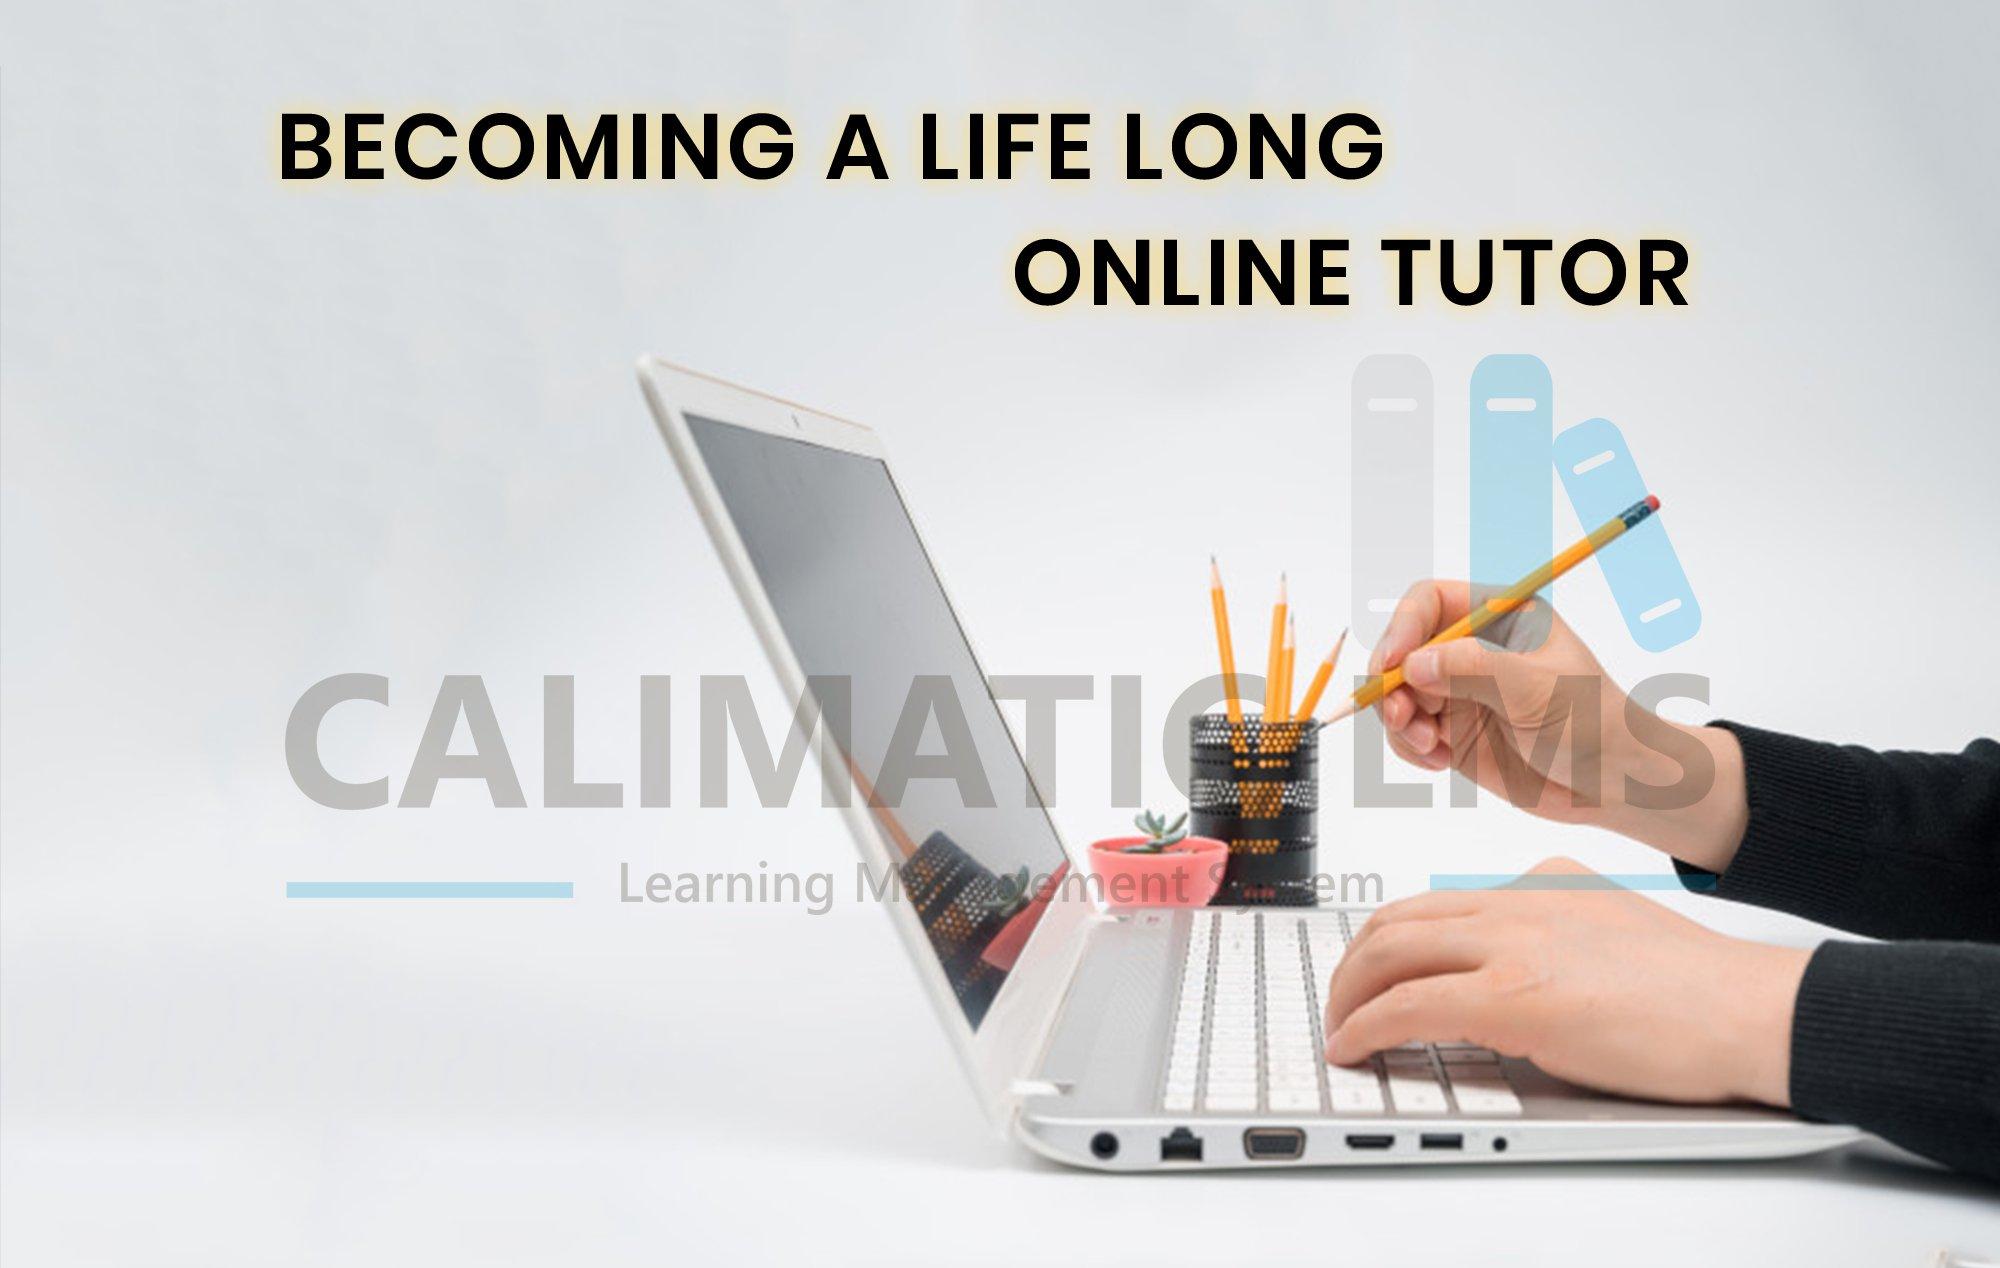 Online Tutor - Calimatic EdTech